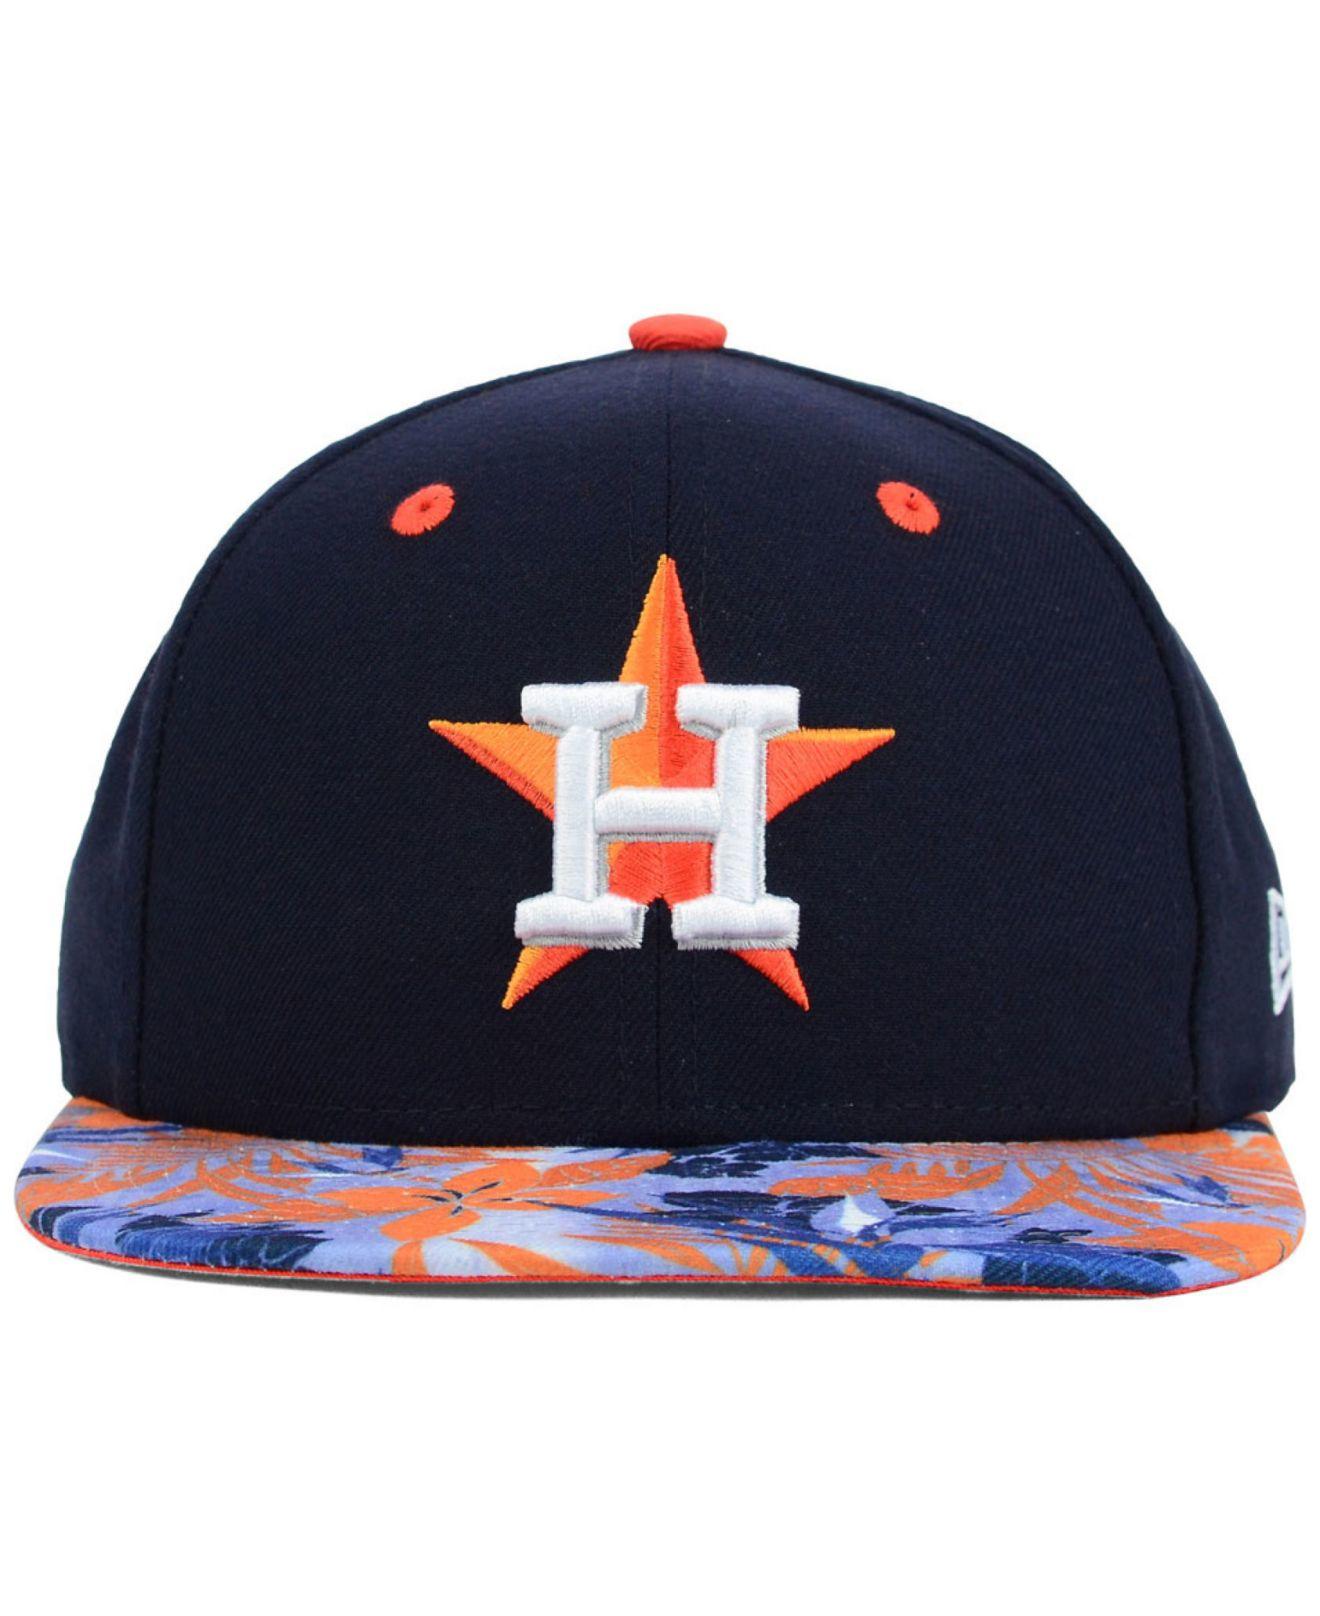 91c9c356708 Lyst - KTZ Houston Astros Floral Viz 9fifty Snapback Cap in Blue for Men